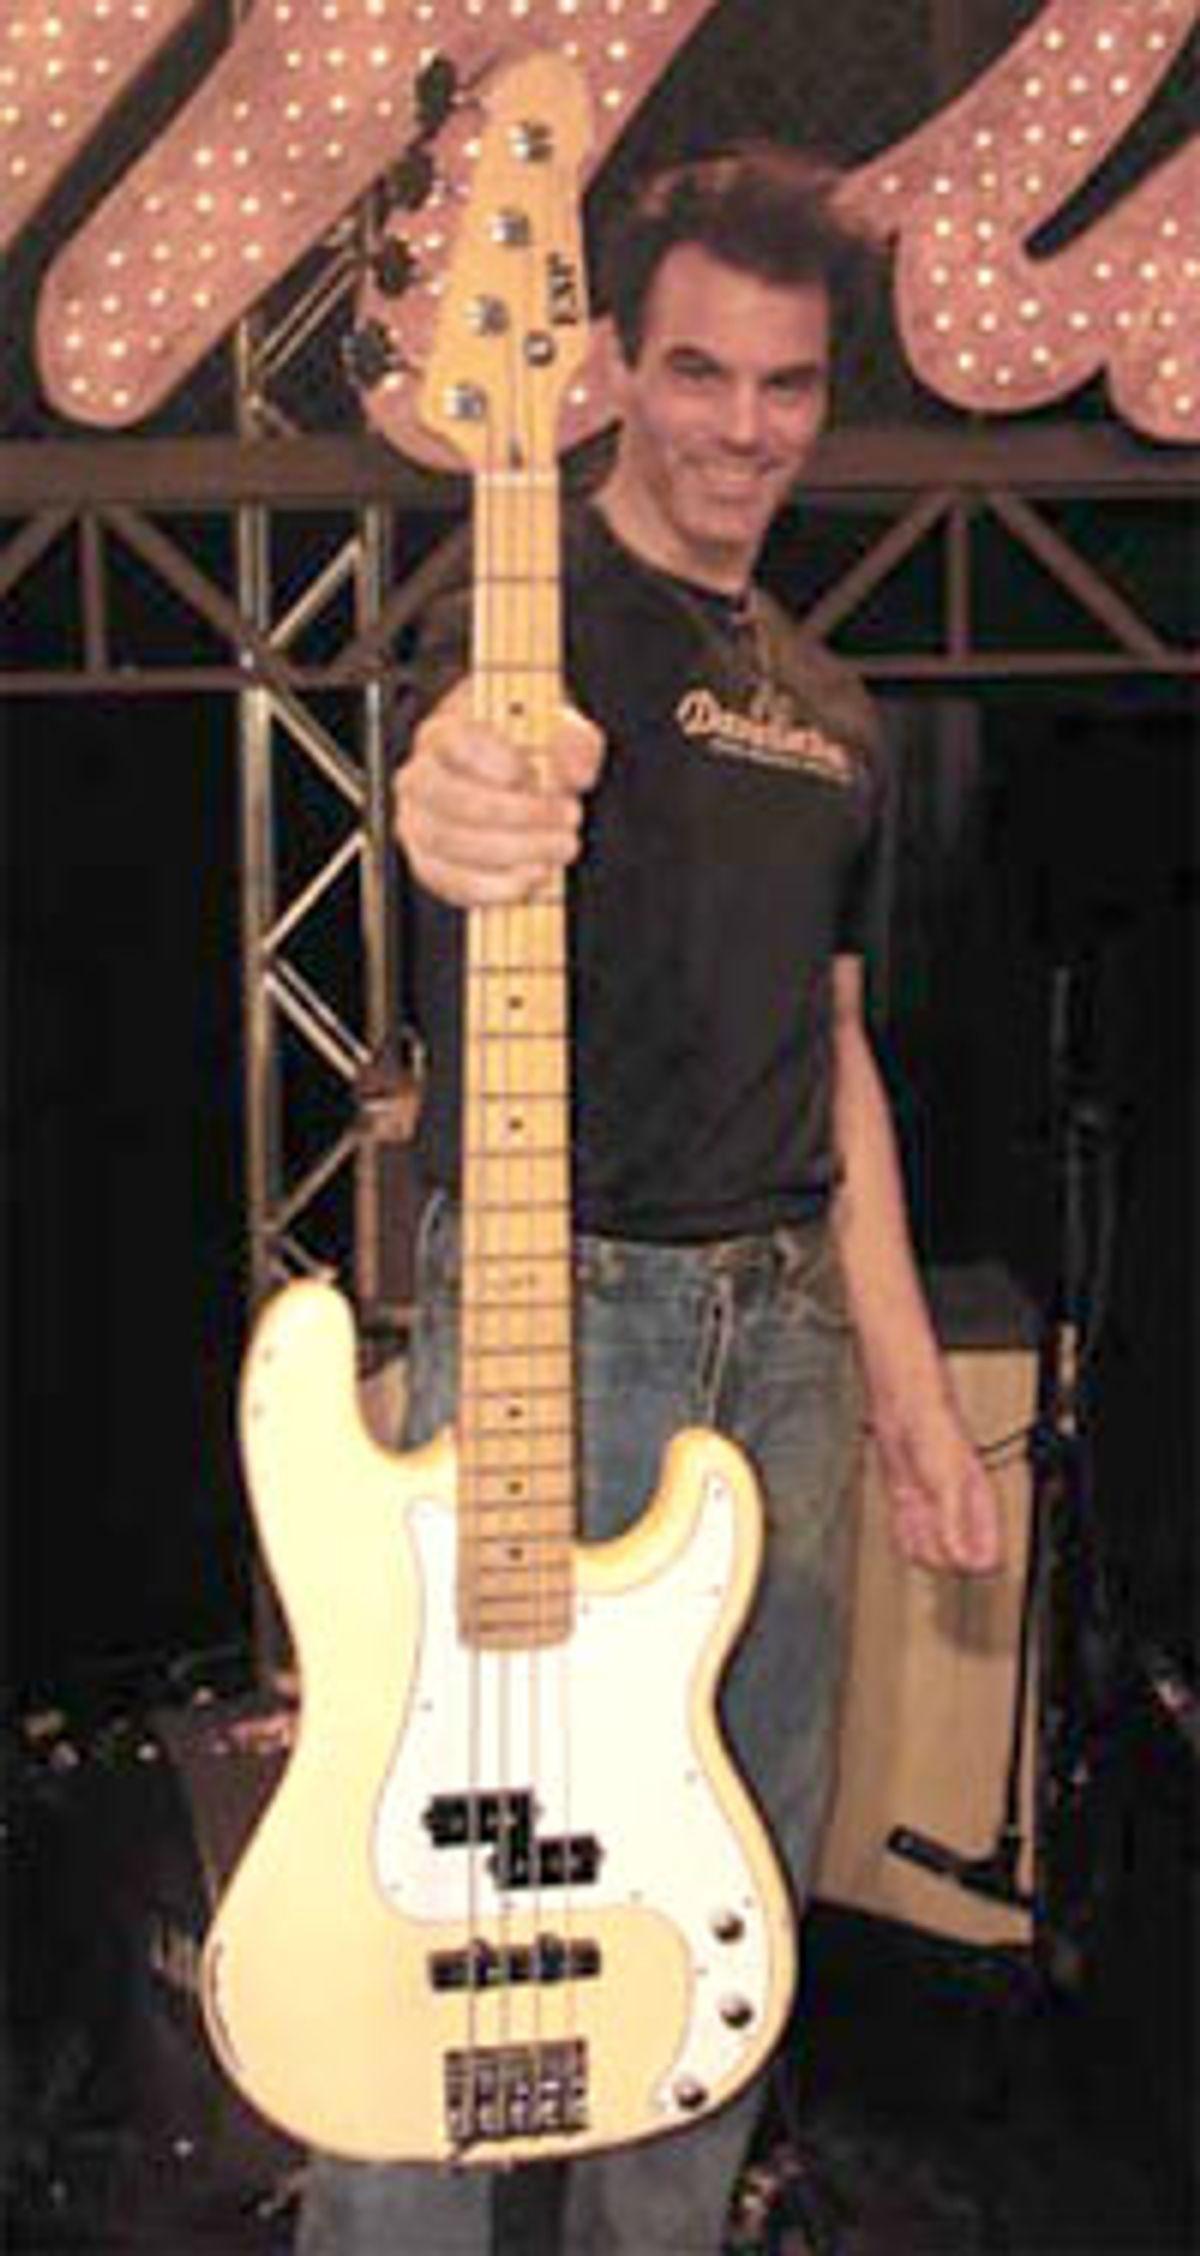 The Bass-ics